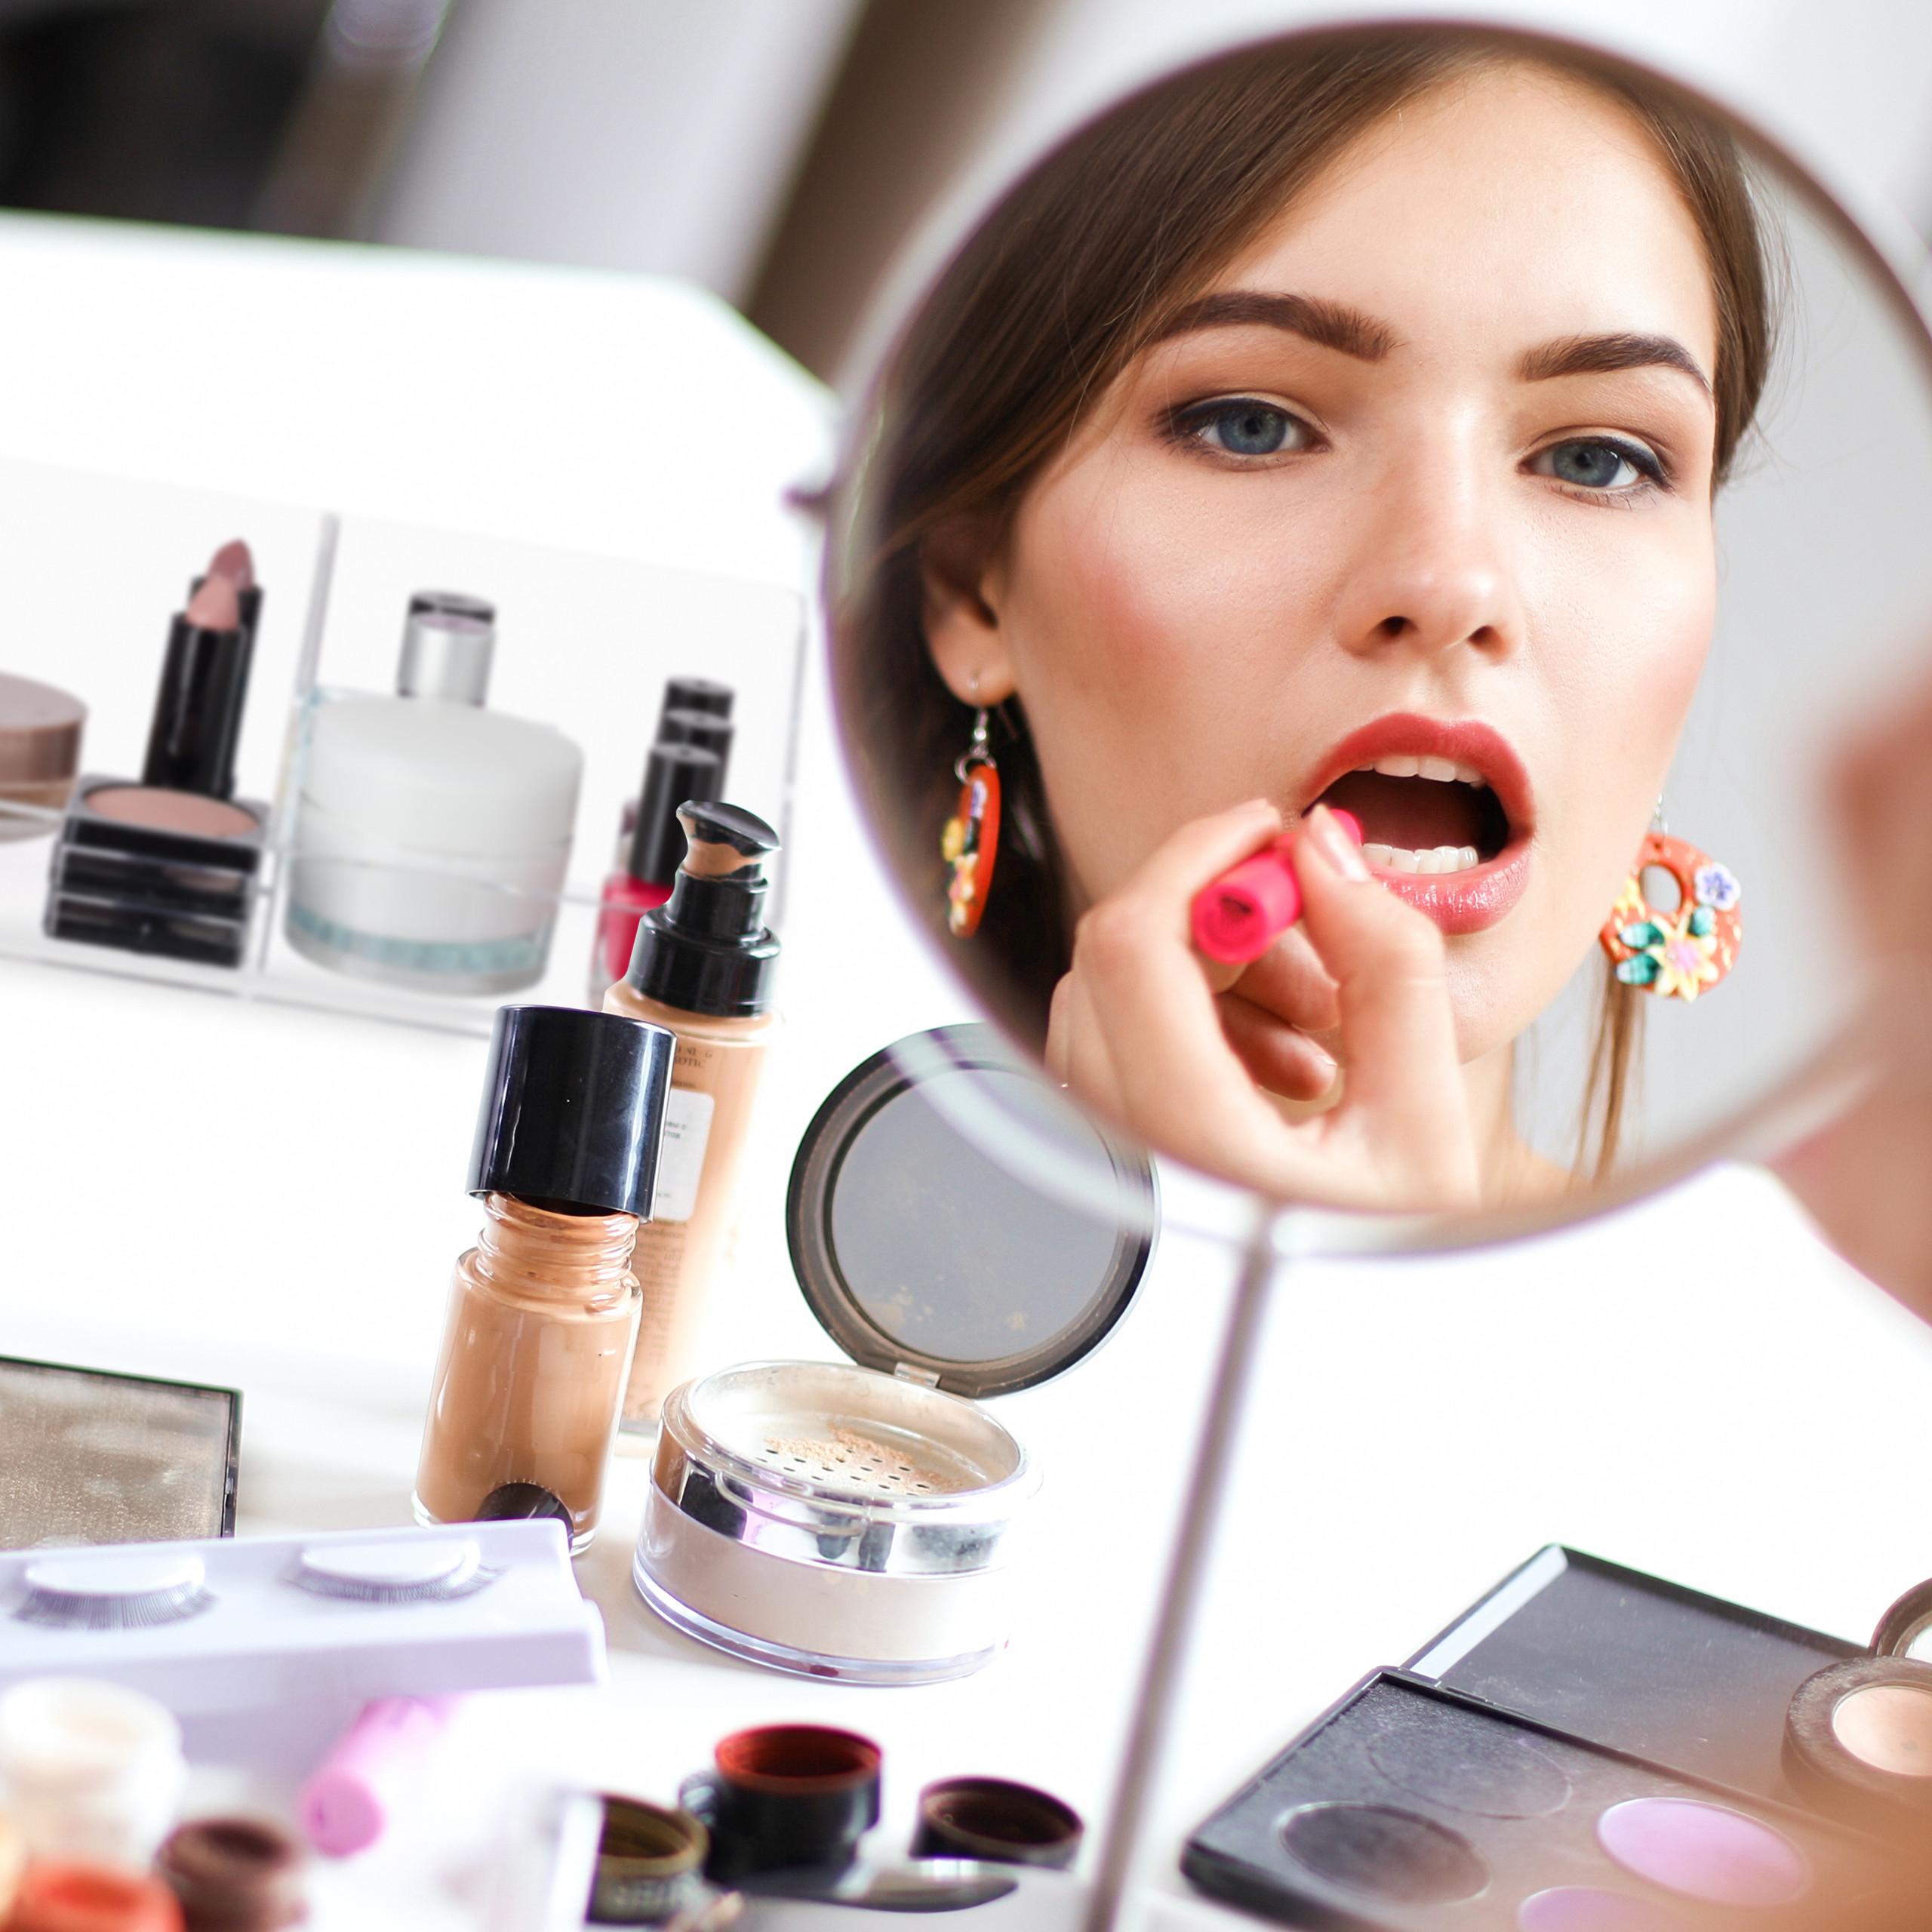 make-up-organizer-cosmetica-organizer-acryl-2-vakken-badkamer-opbergen miniatuur 6